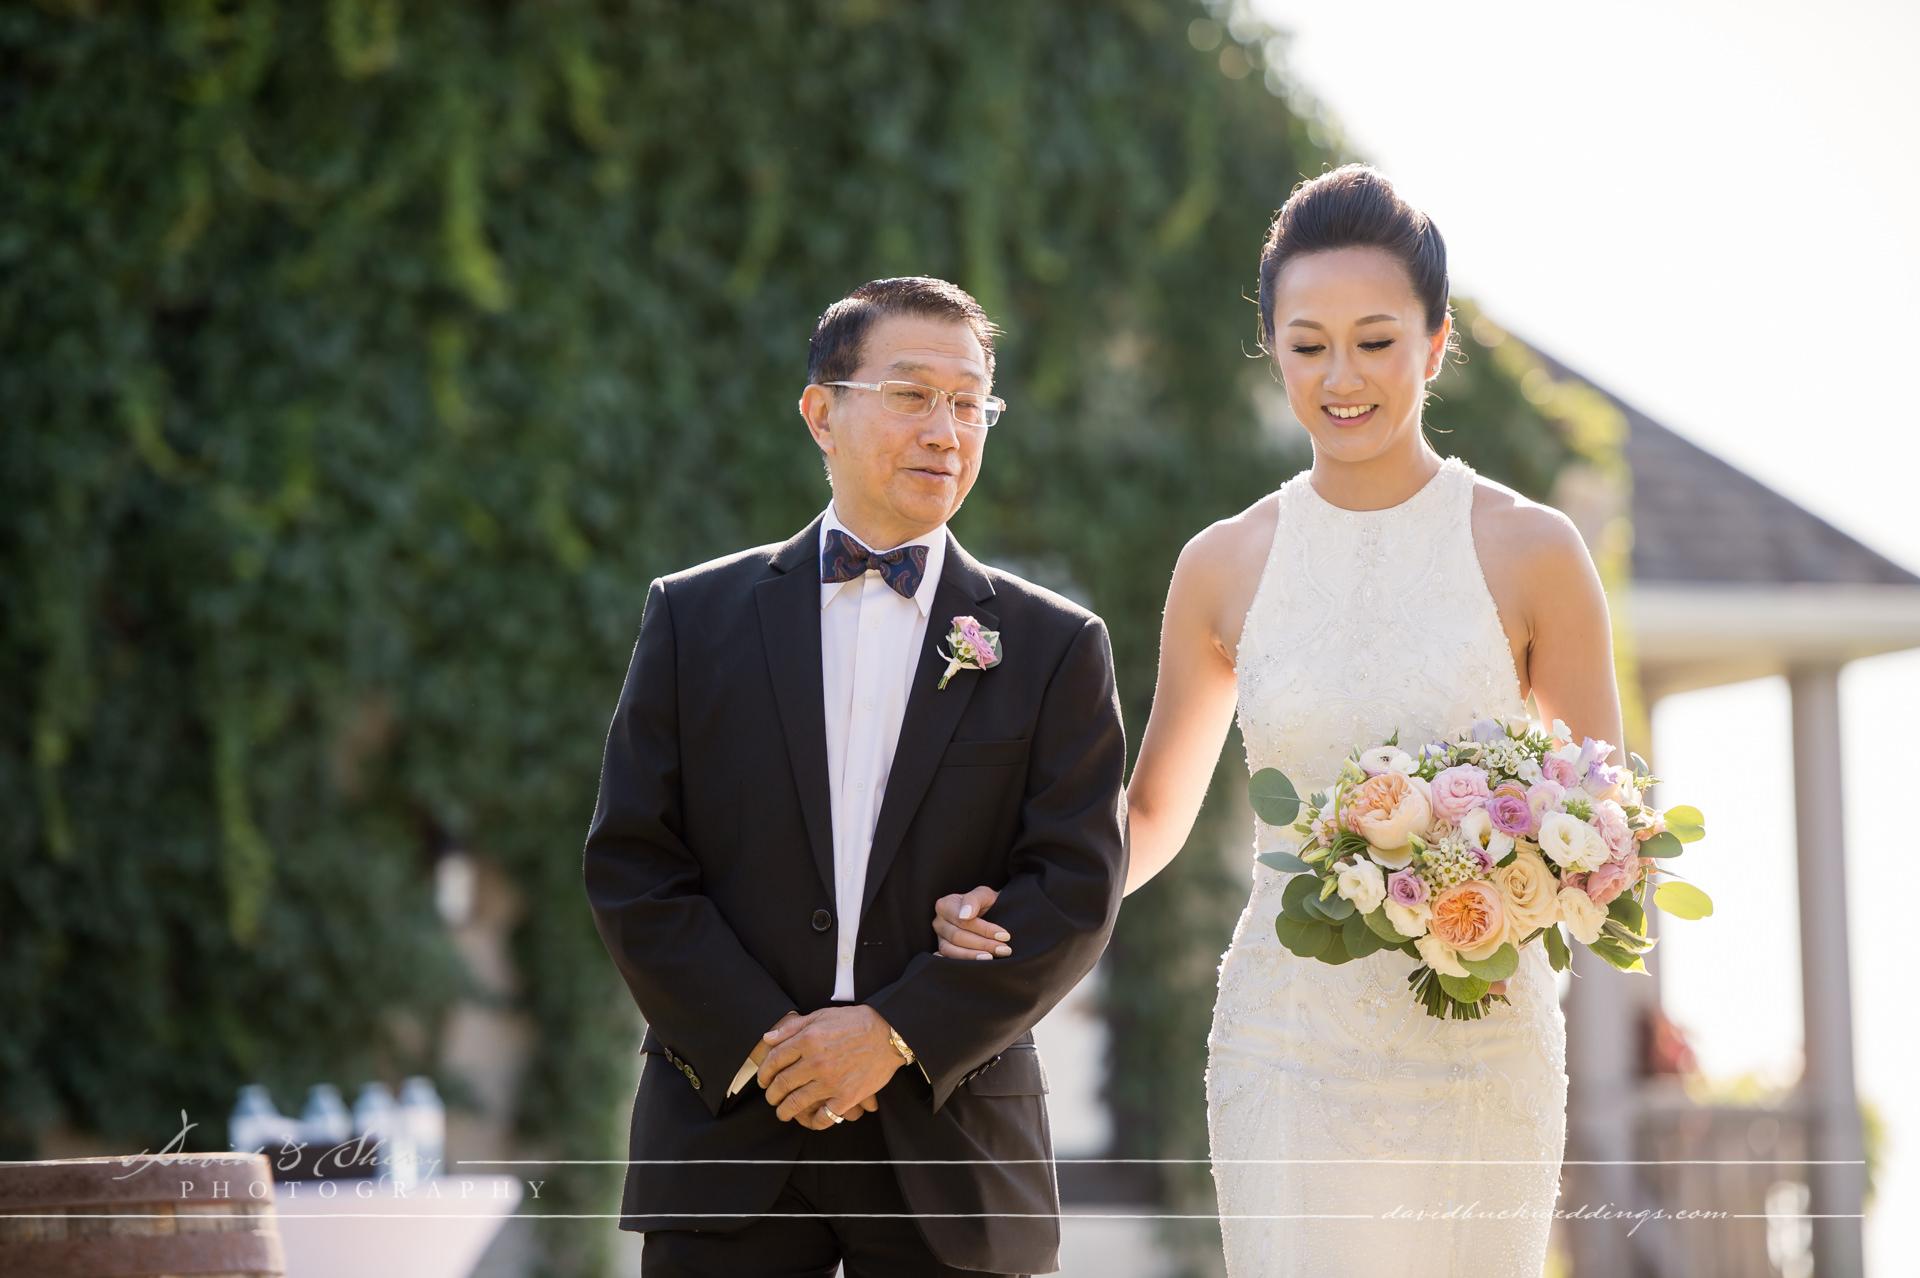 waterstone-estate-wedding-david-sherry-photography-simon-crystal-018